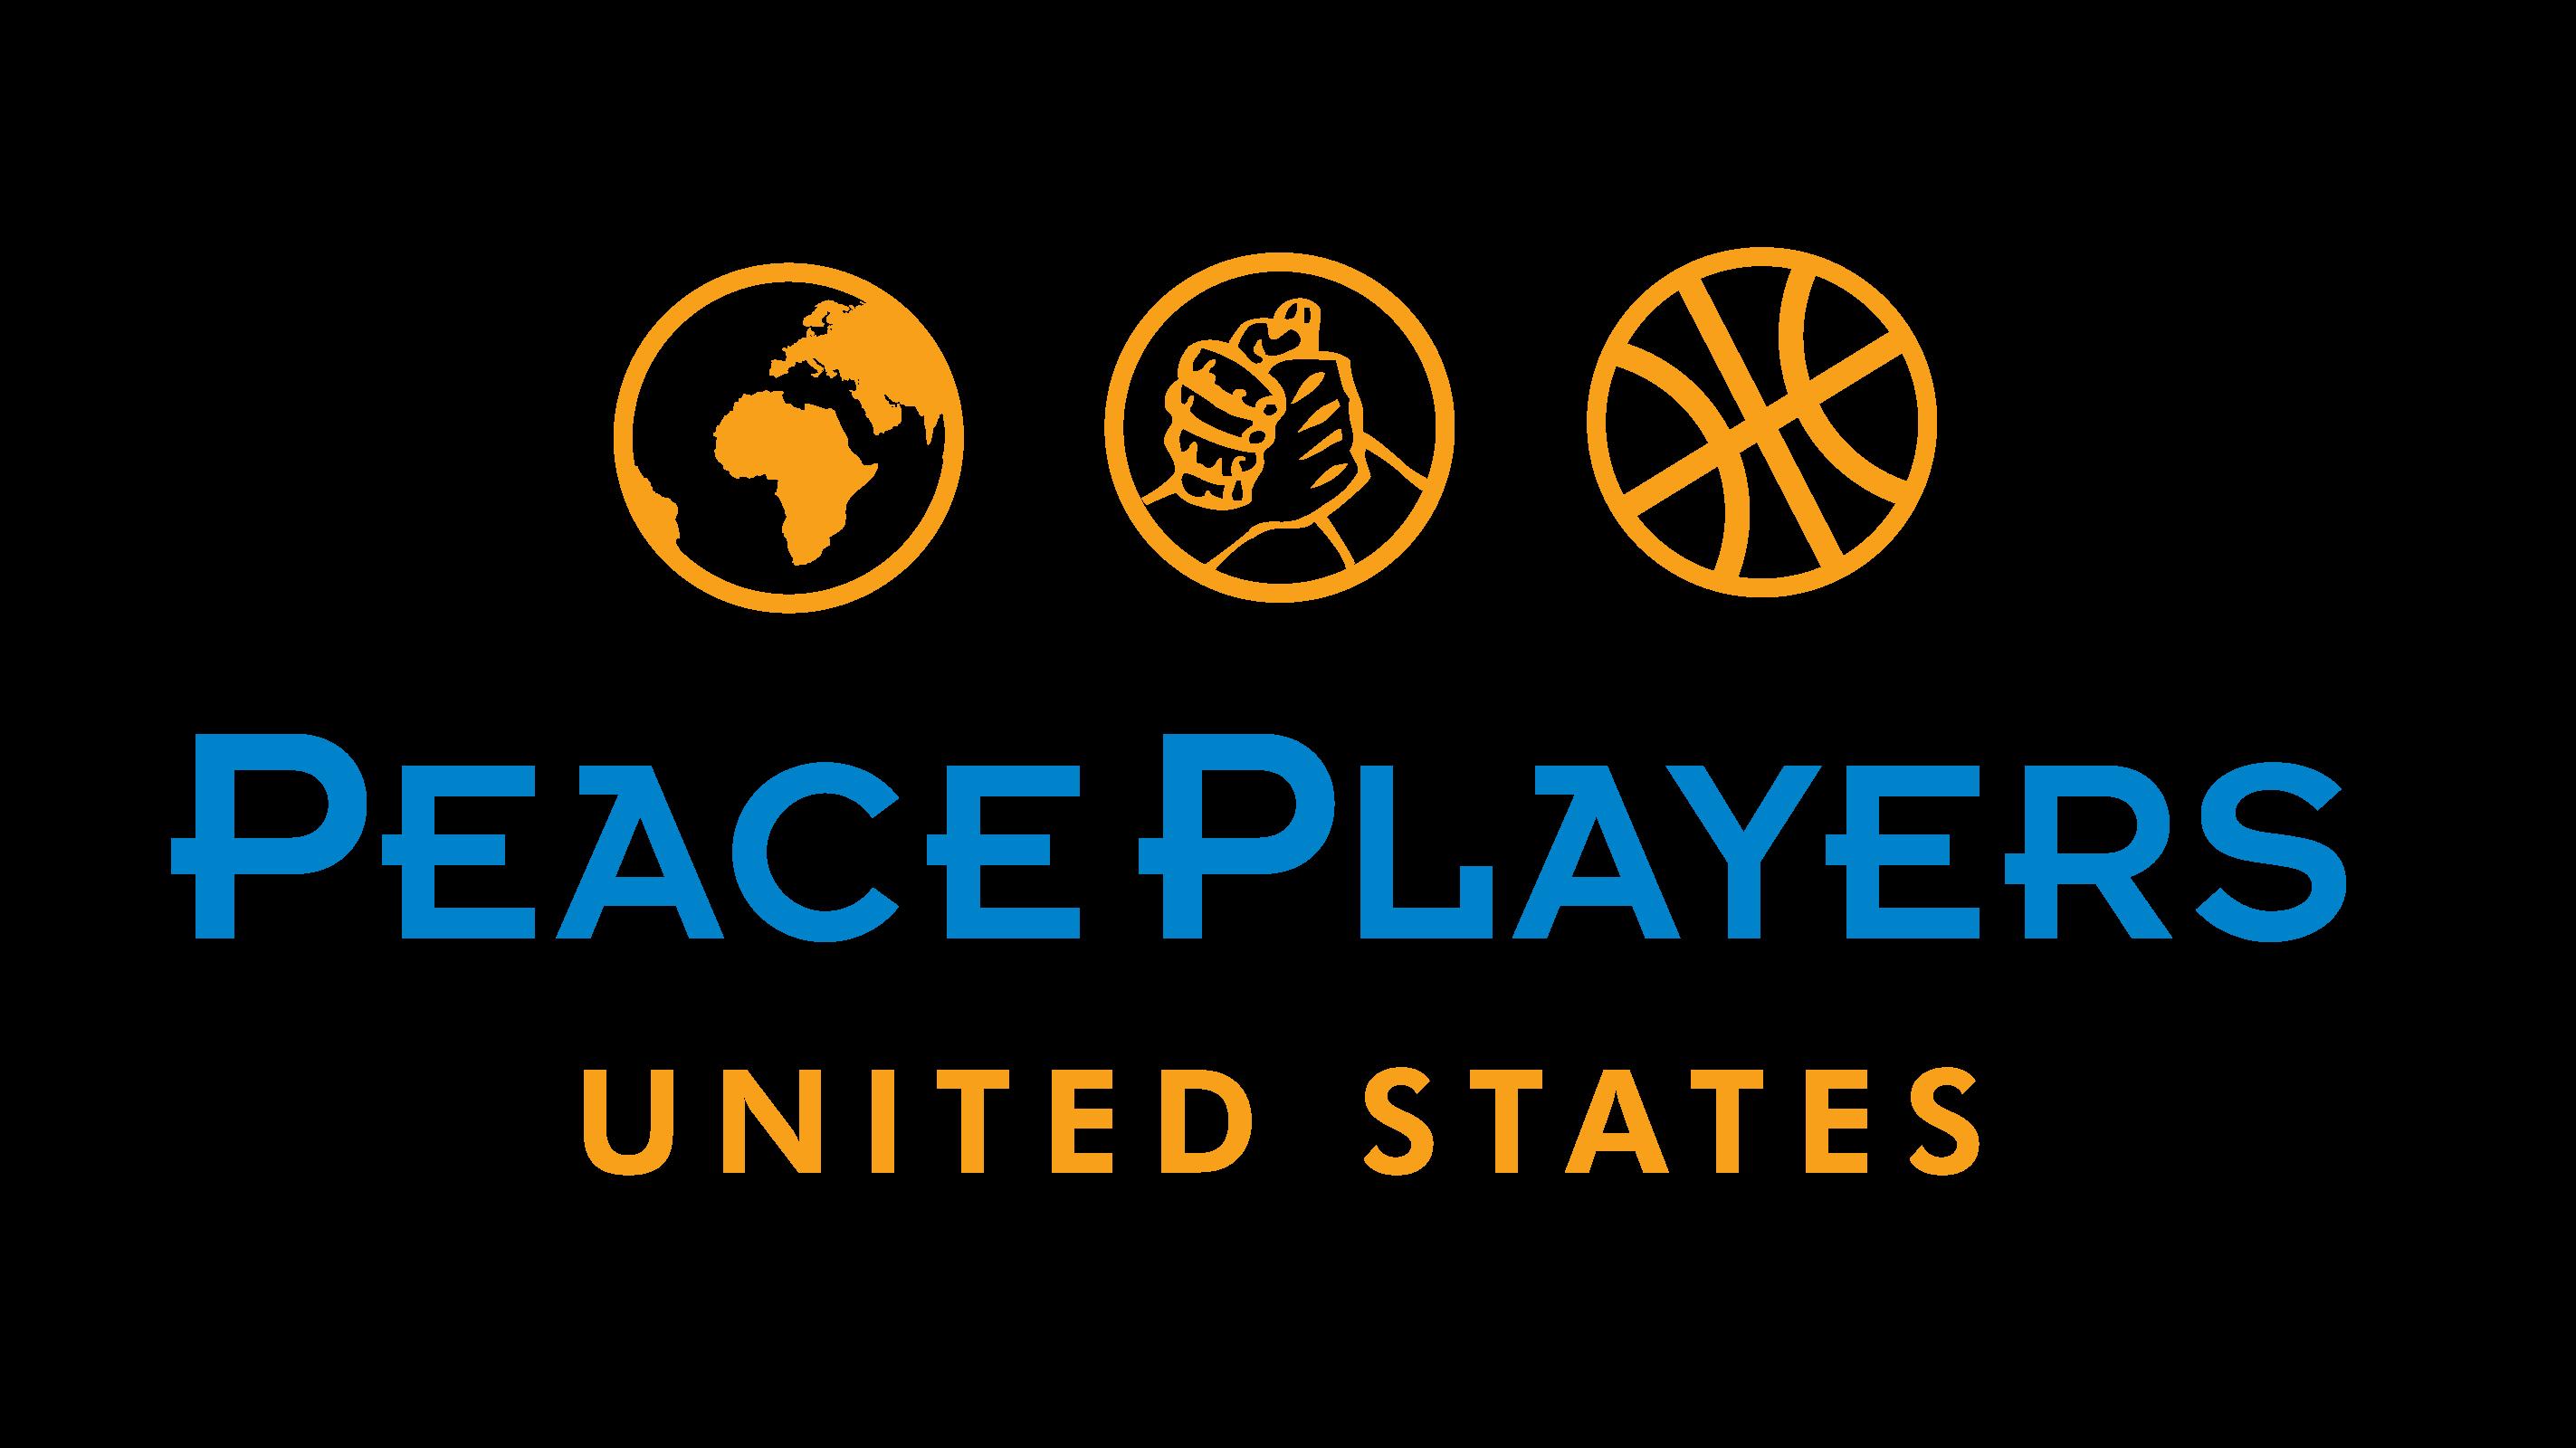 PeacePlayers United States Logo